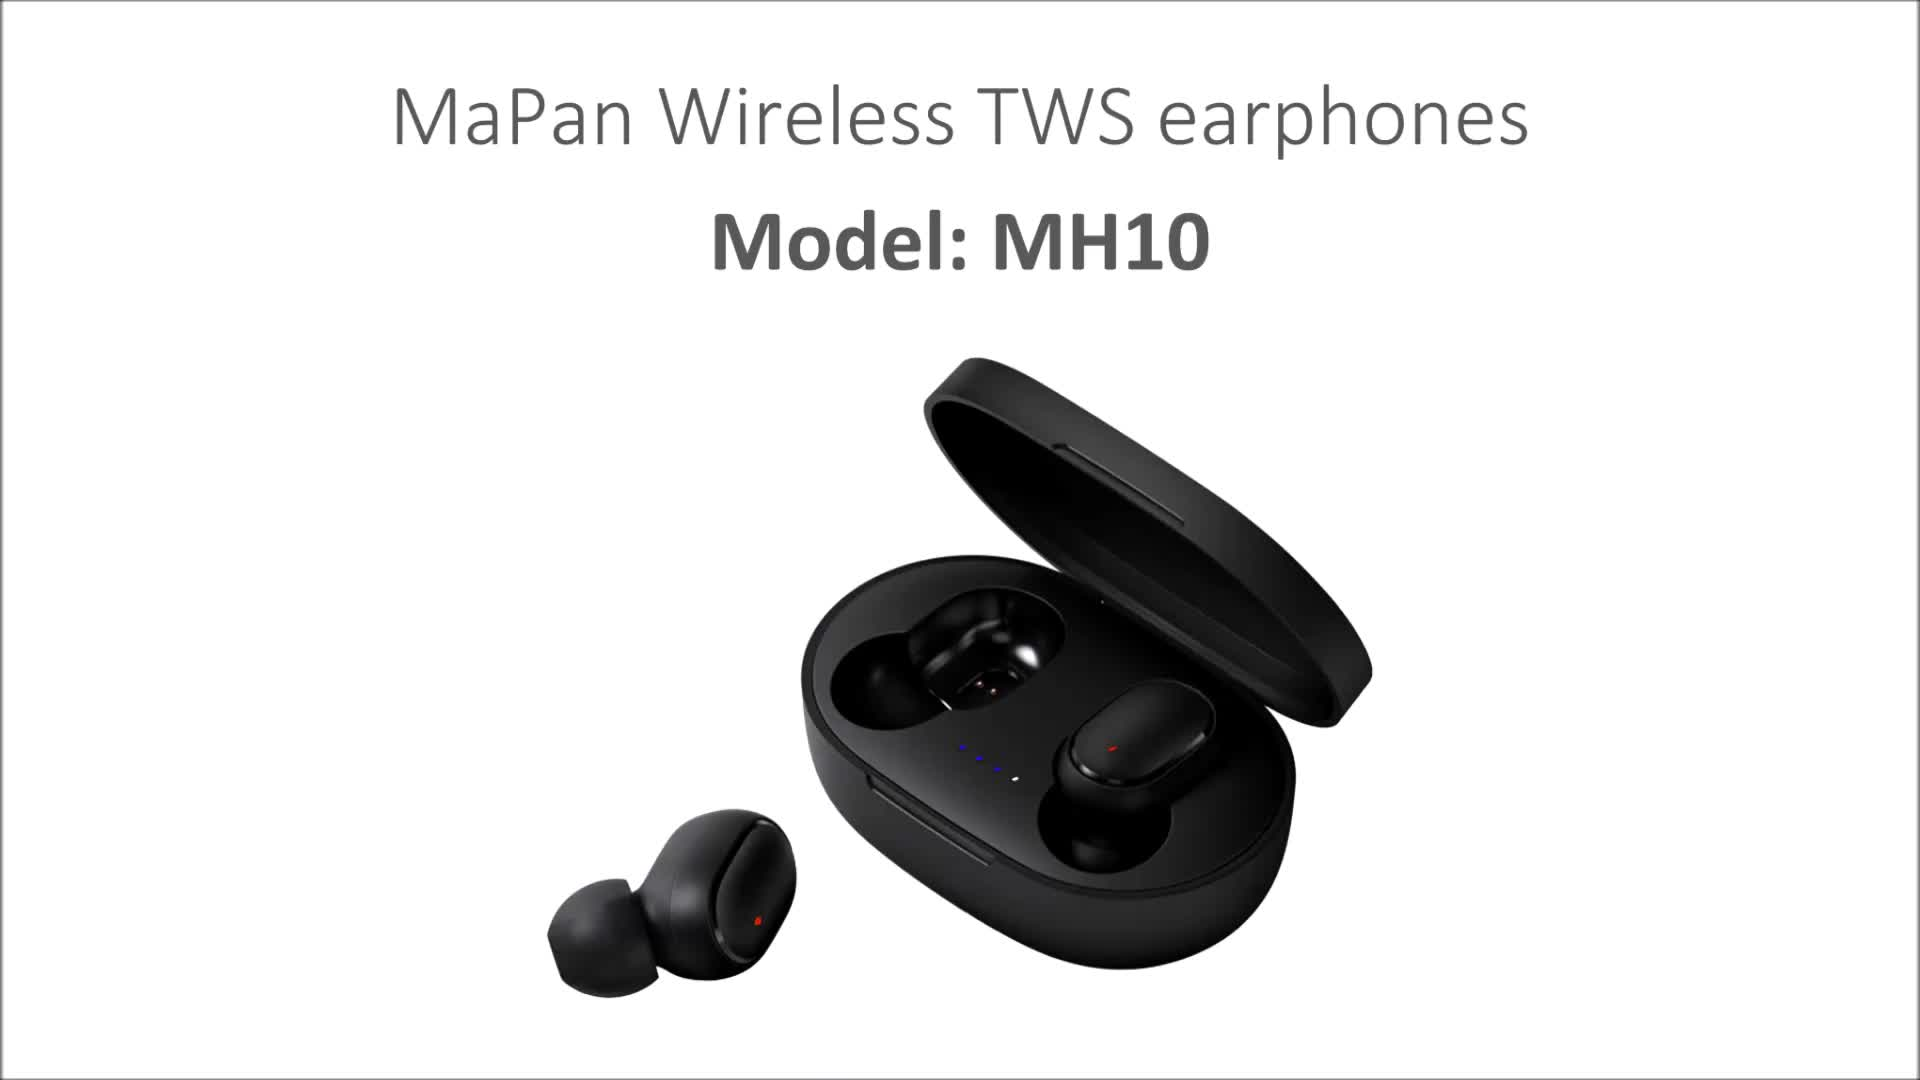 Gratis Pengiriman Mapan Headset Bluetooth, Tws HI FI Wireless Stereo Bisnis Handfree Juga Earphone